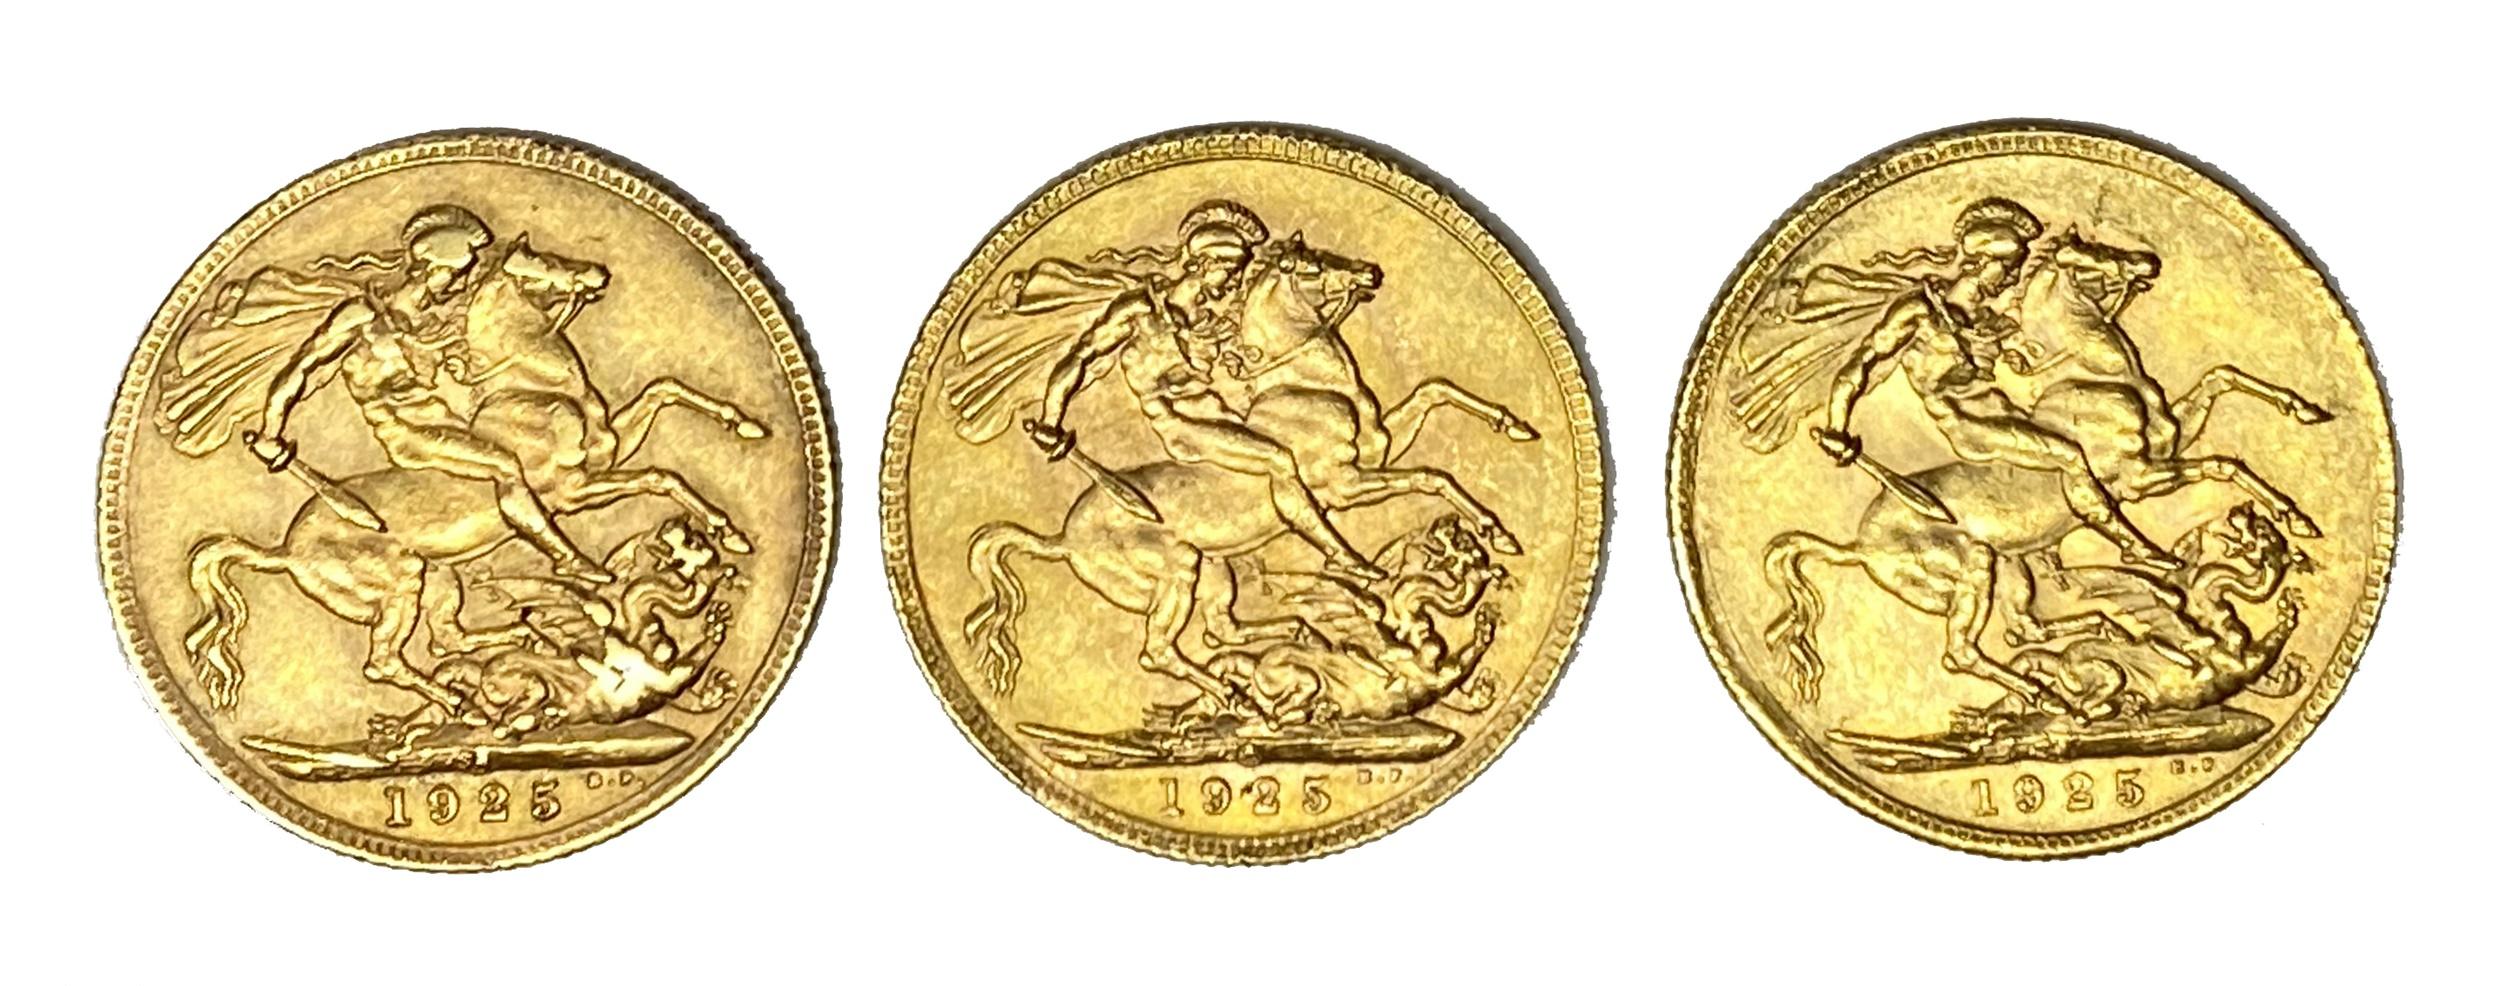 George V three gold Sovereign coins, 1925, Pretoria mint - Image 2 of 2